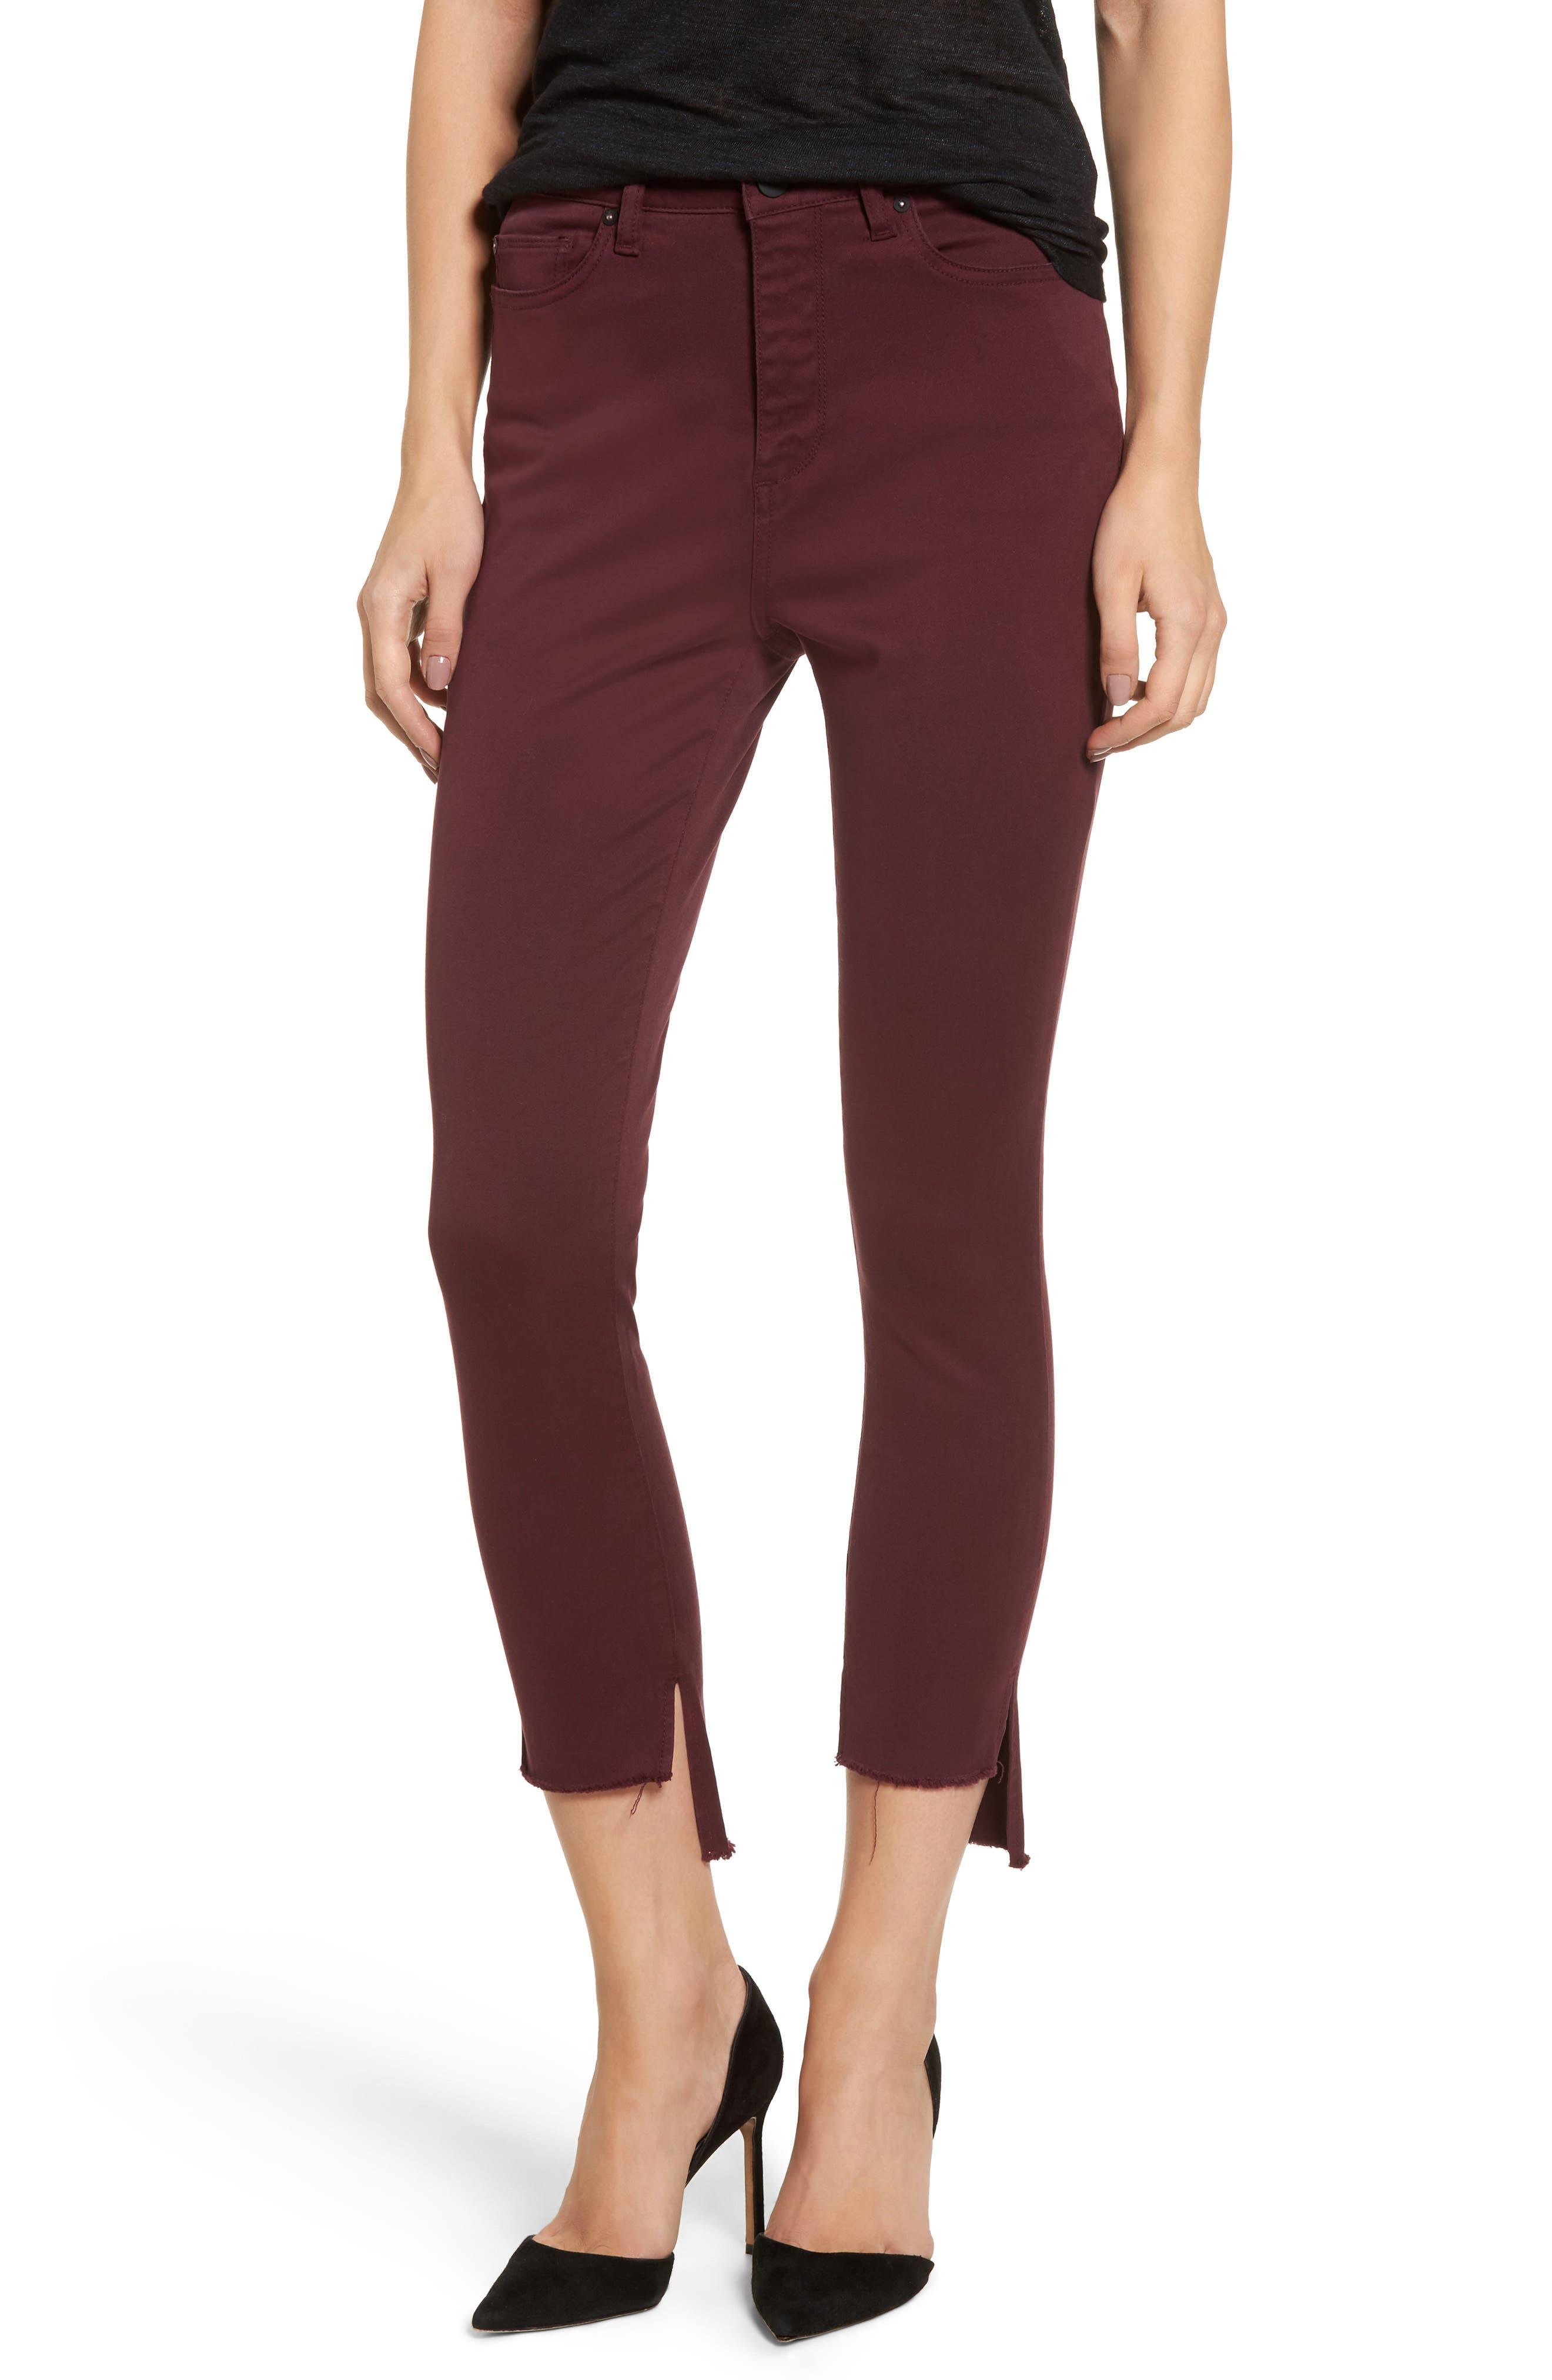 DL1961 Chrissy Trimstone High Waist Step Hem Skinny Jeans (Rouge Noir)